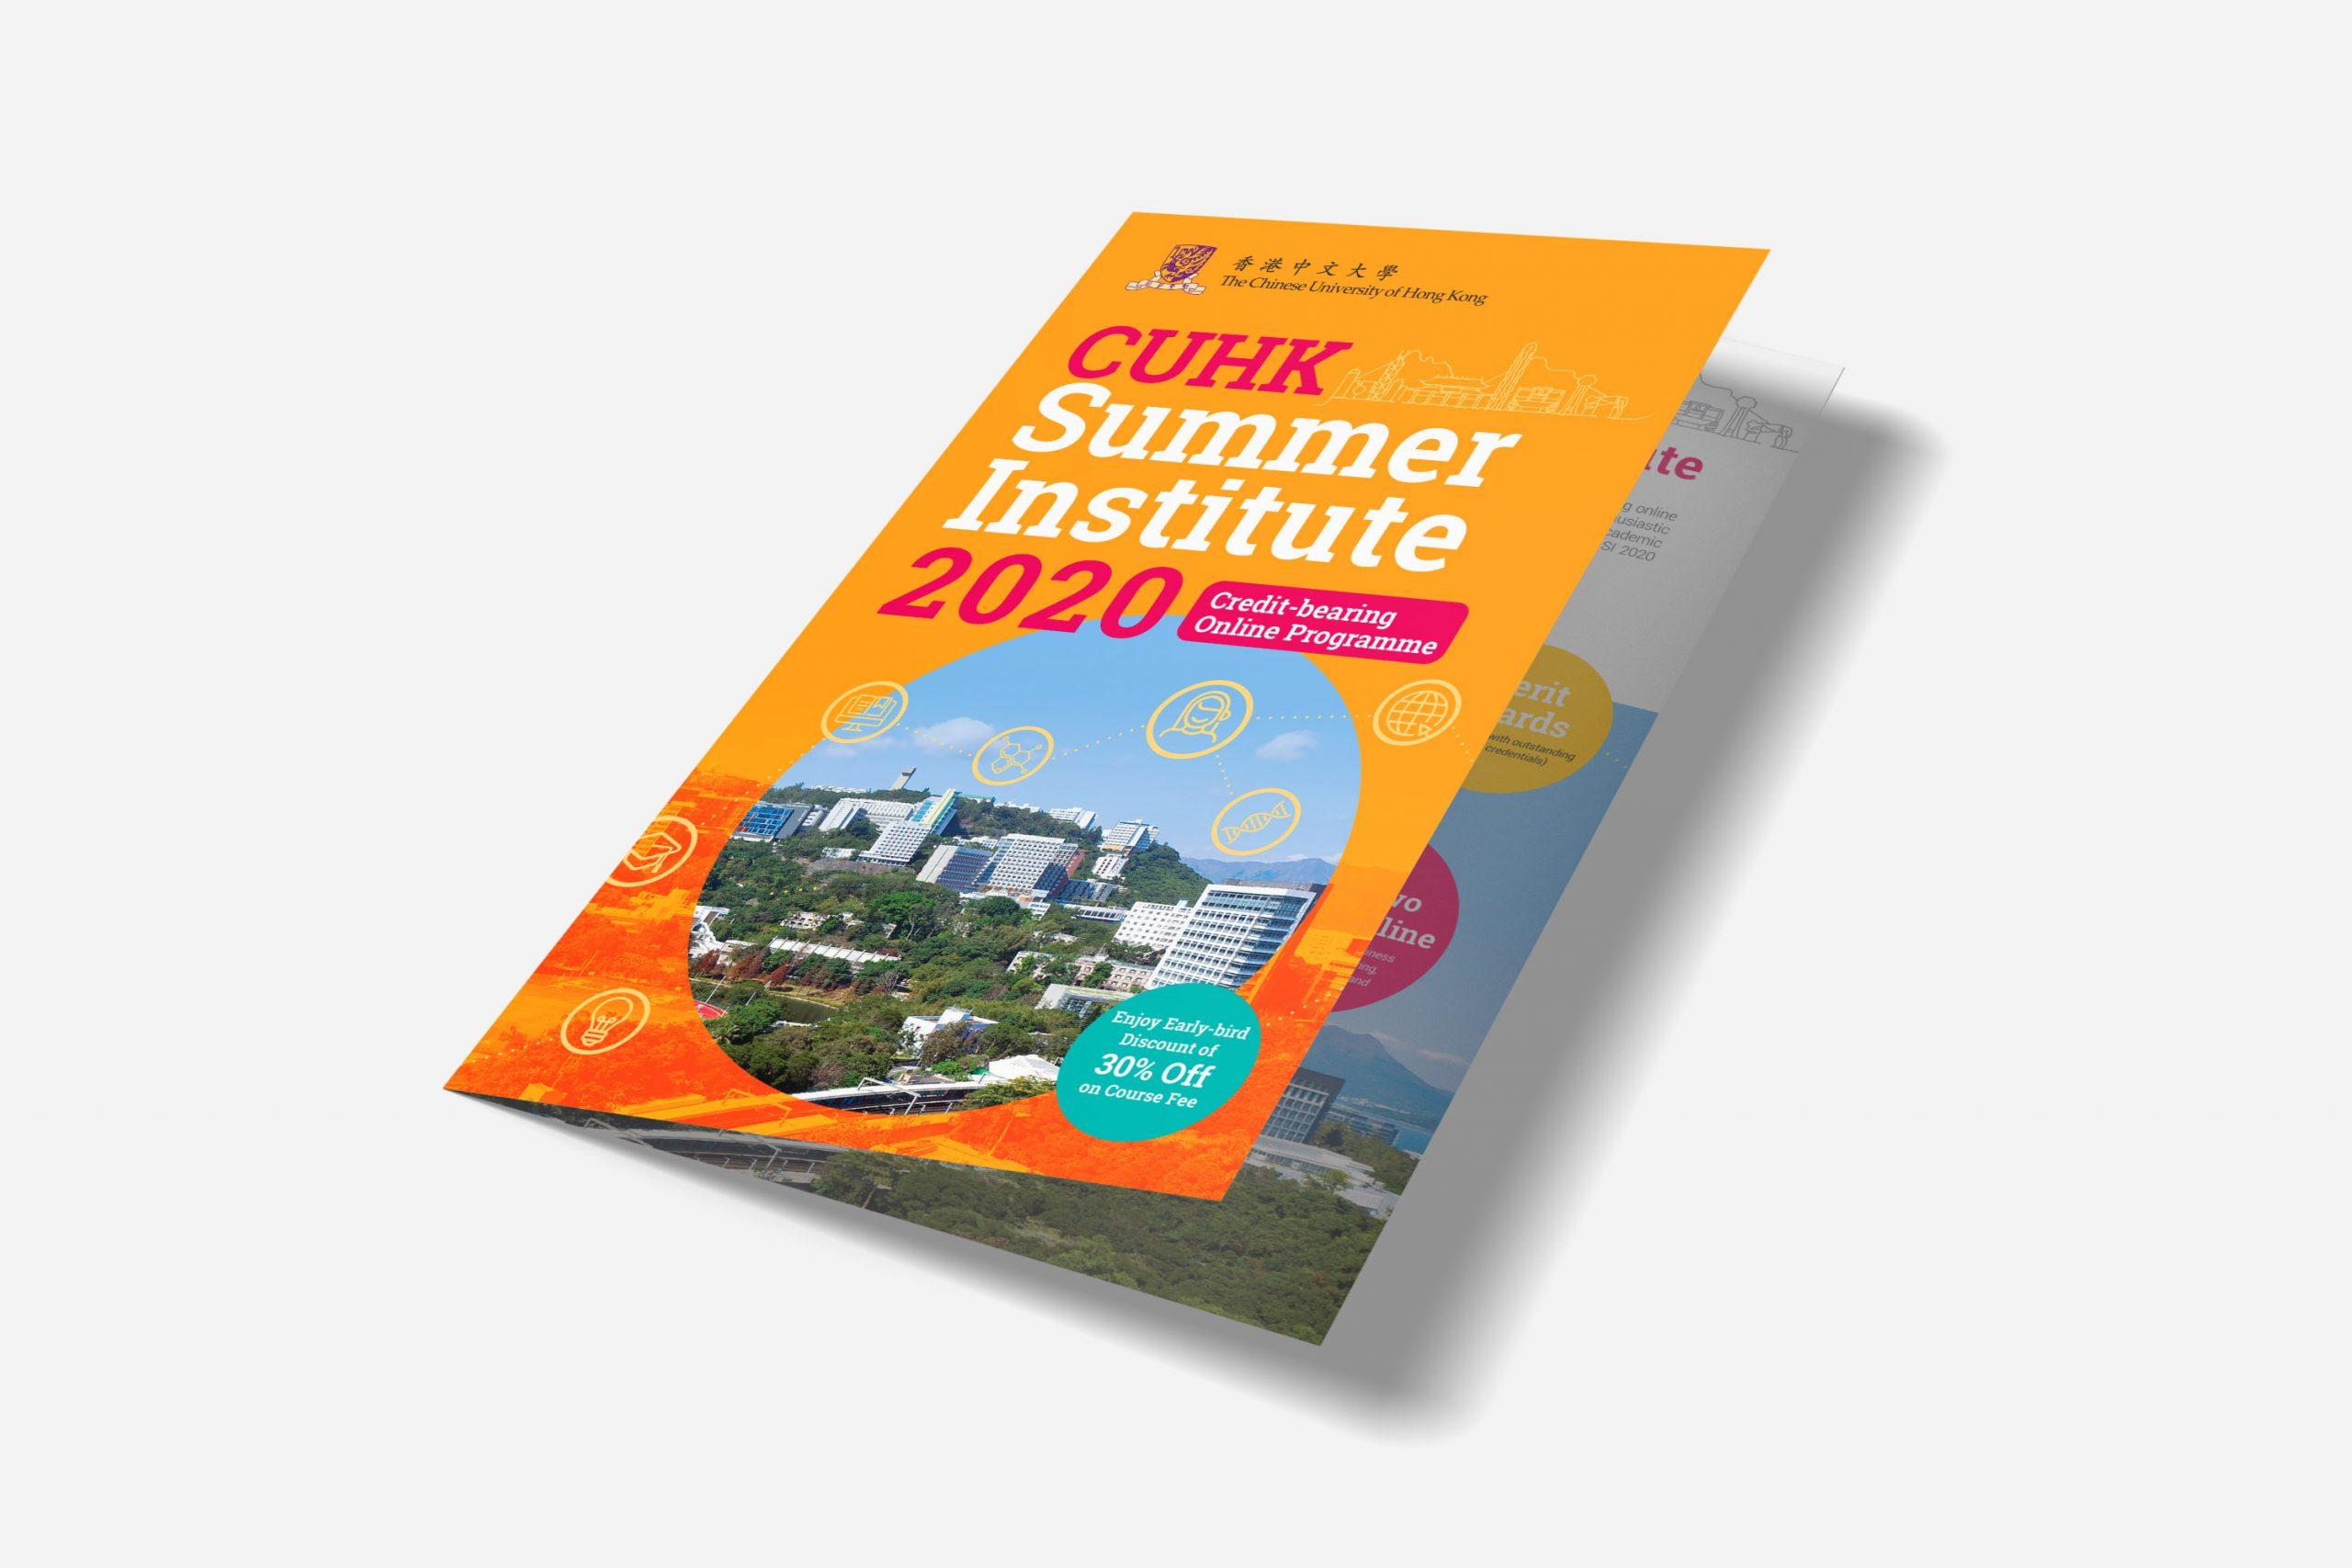 CUHK OAL Summer Institute 2020